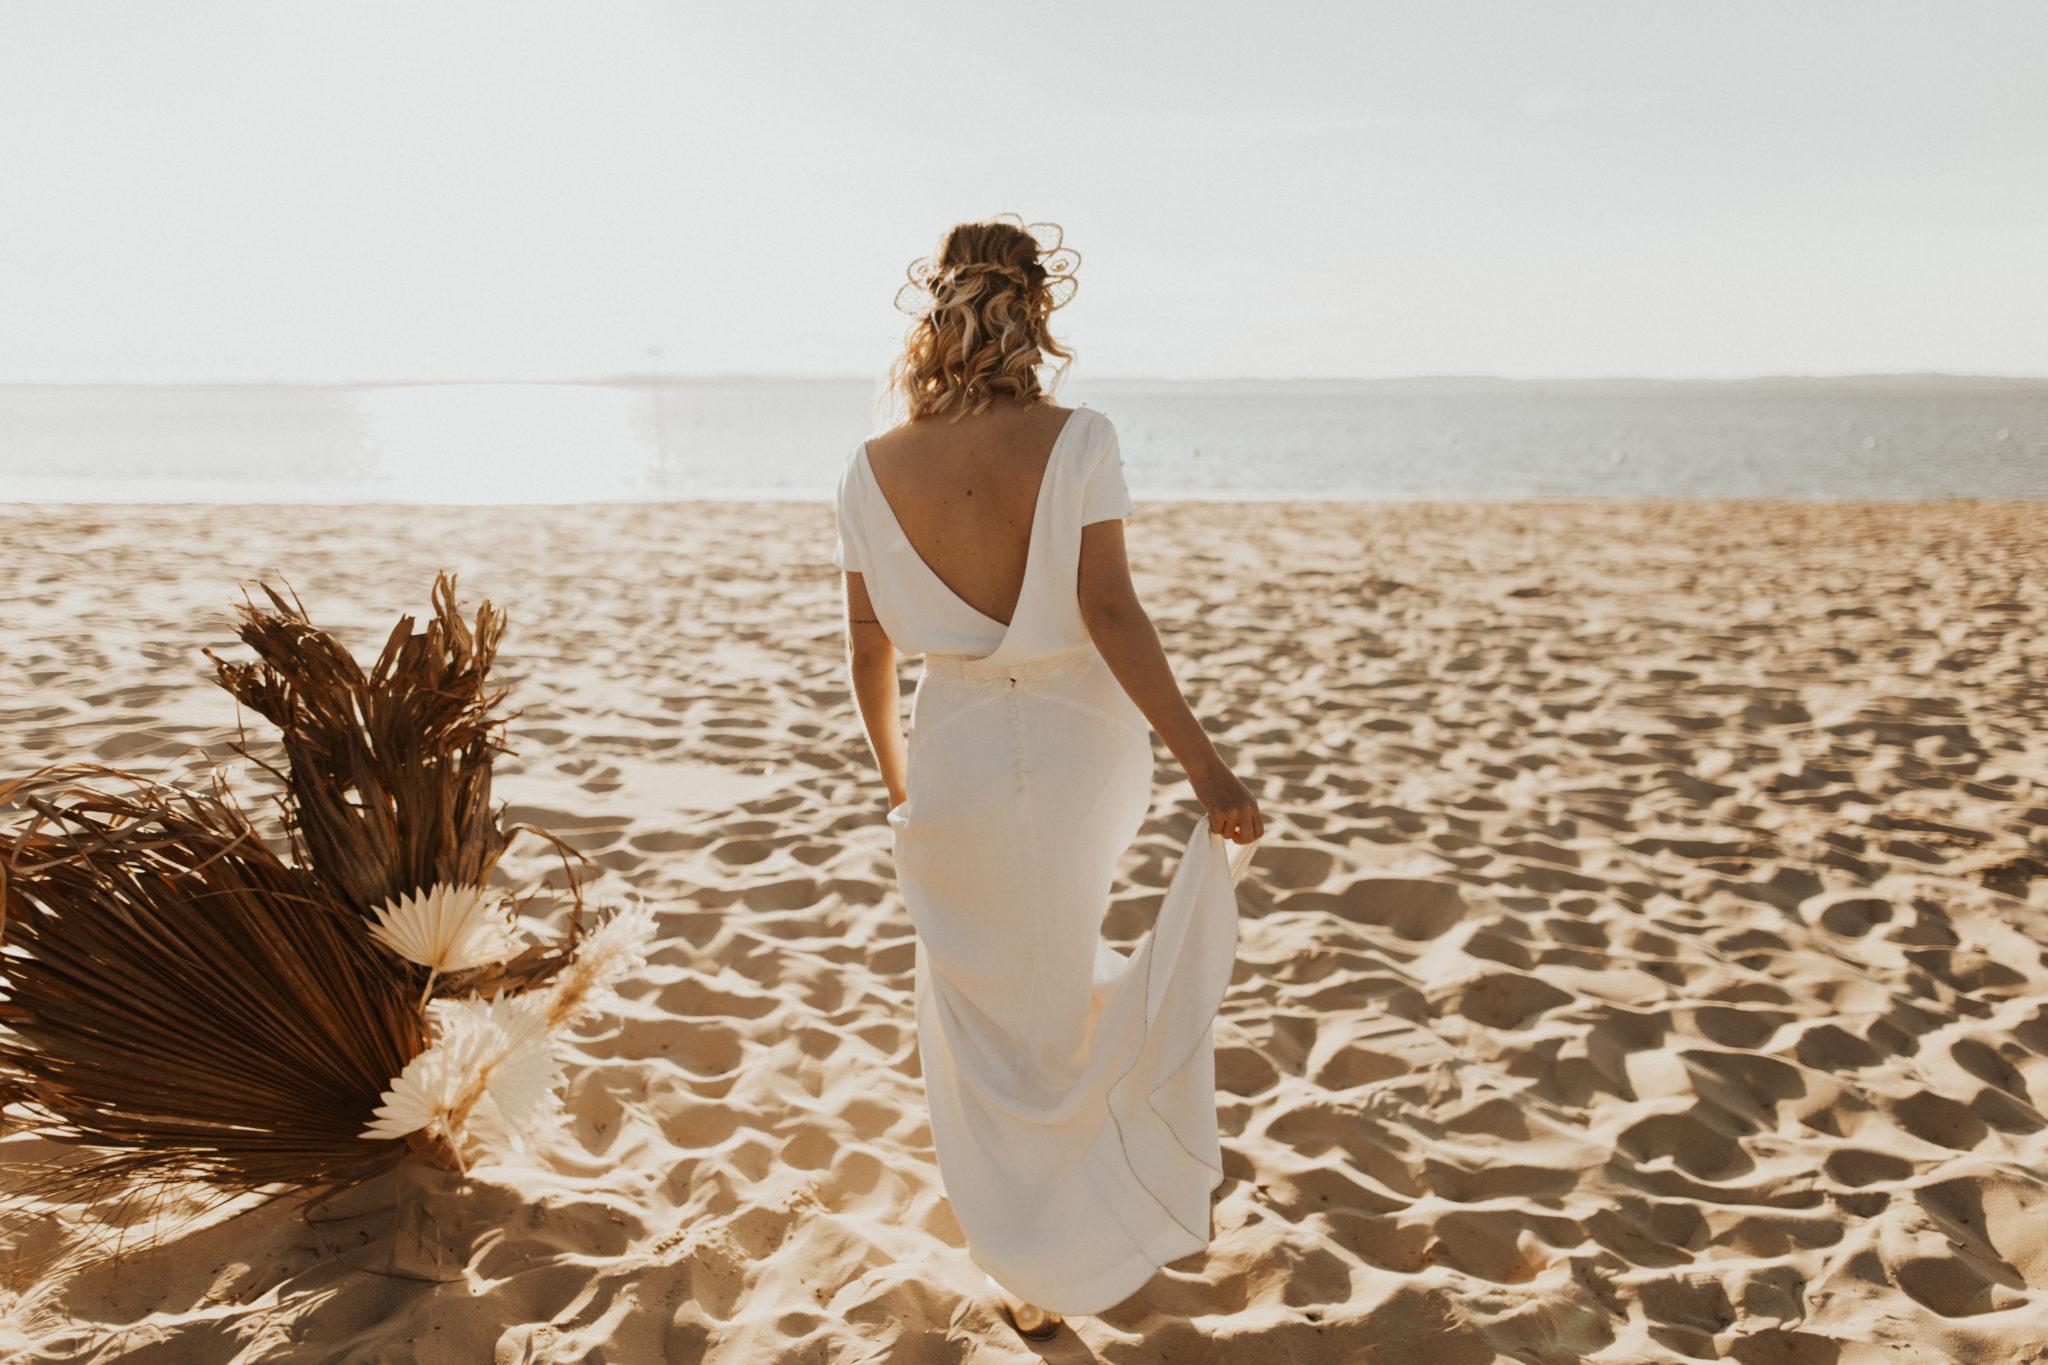 bassin-arcachon-mariage-inspiration-mariee-plage